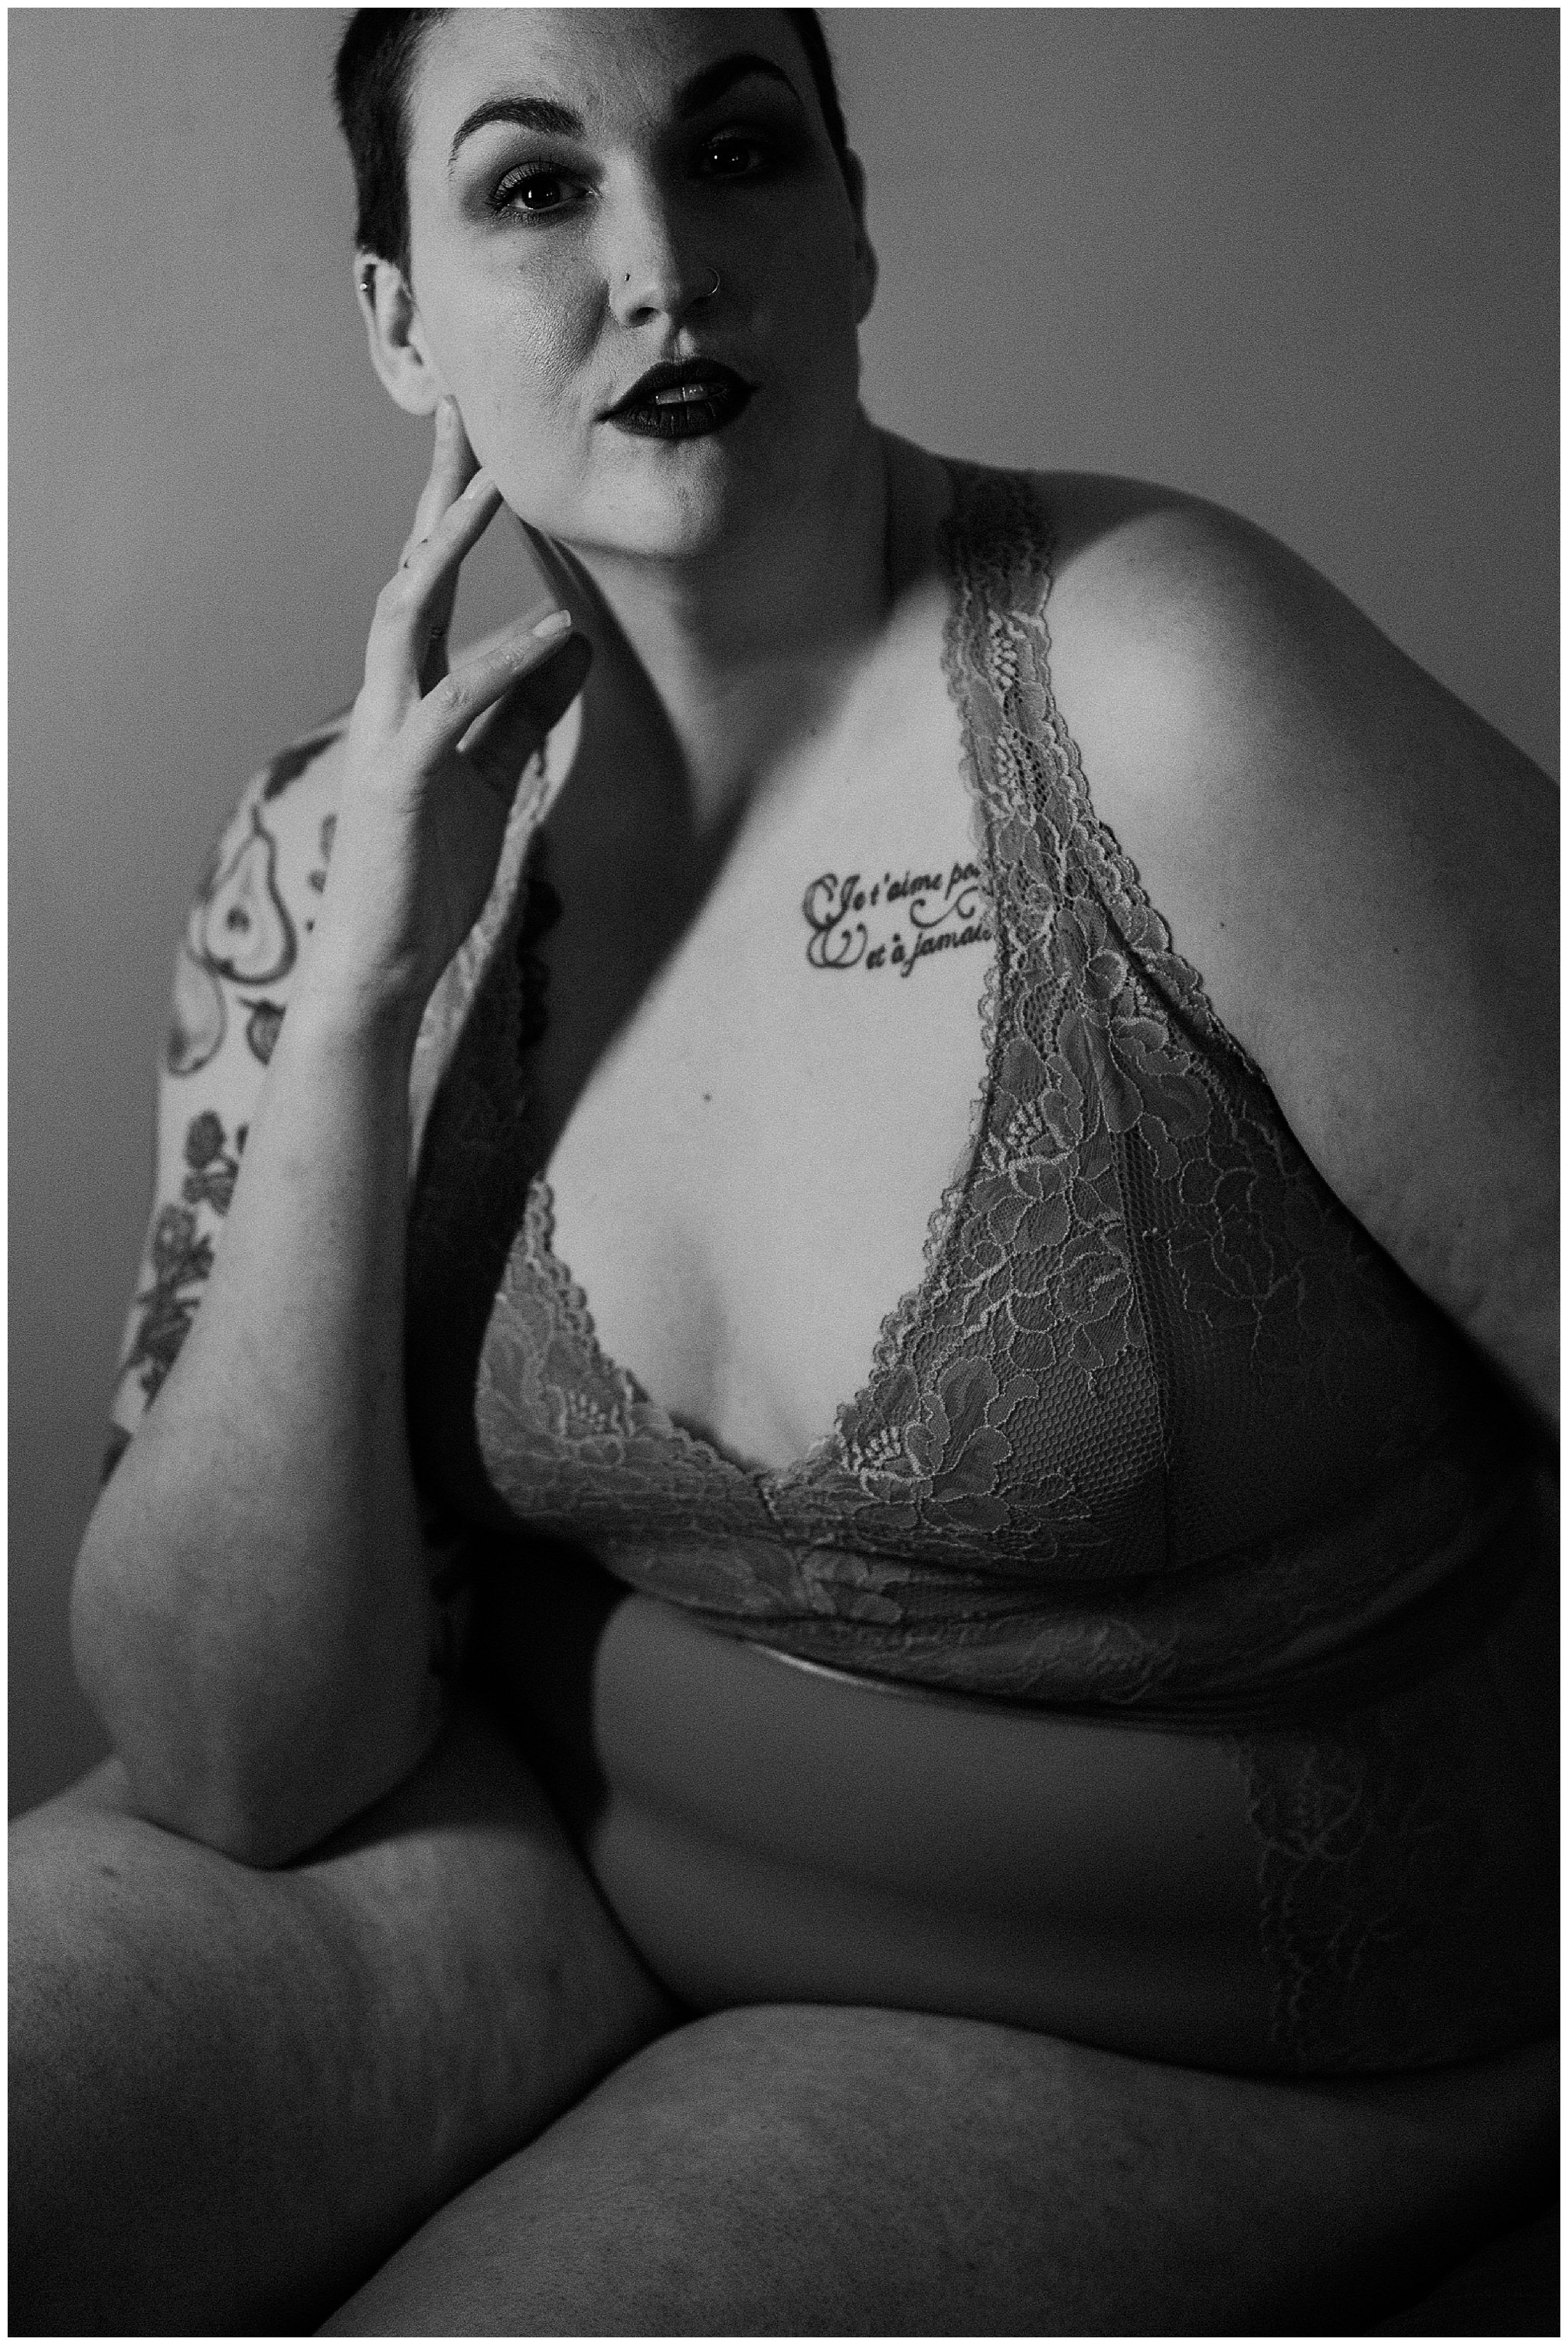 seatac-in-home-boudoir-portraits-kendall-fat-babe-boudoir25.jpg